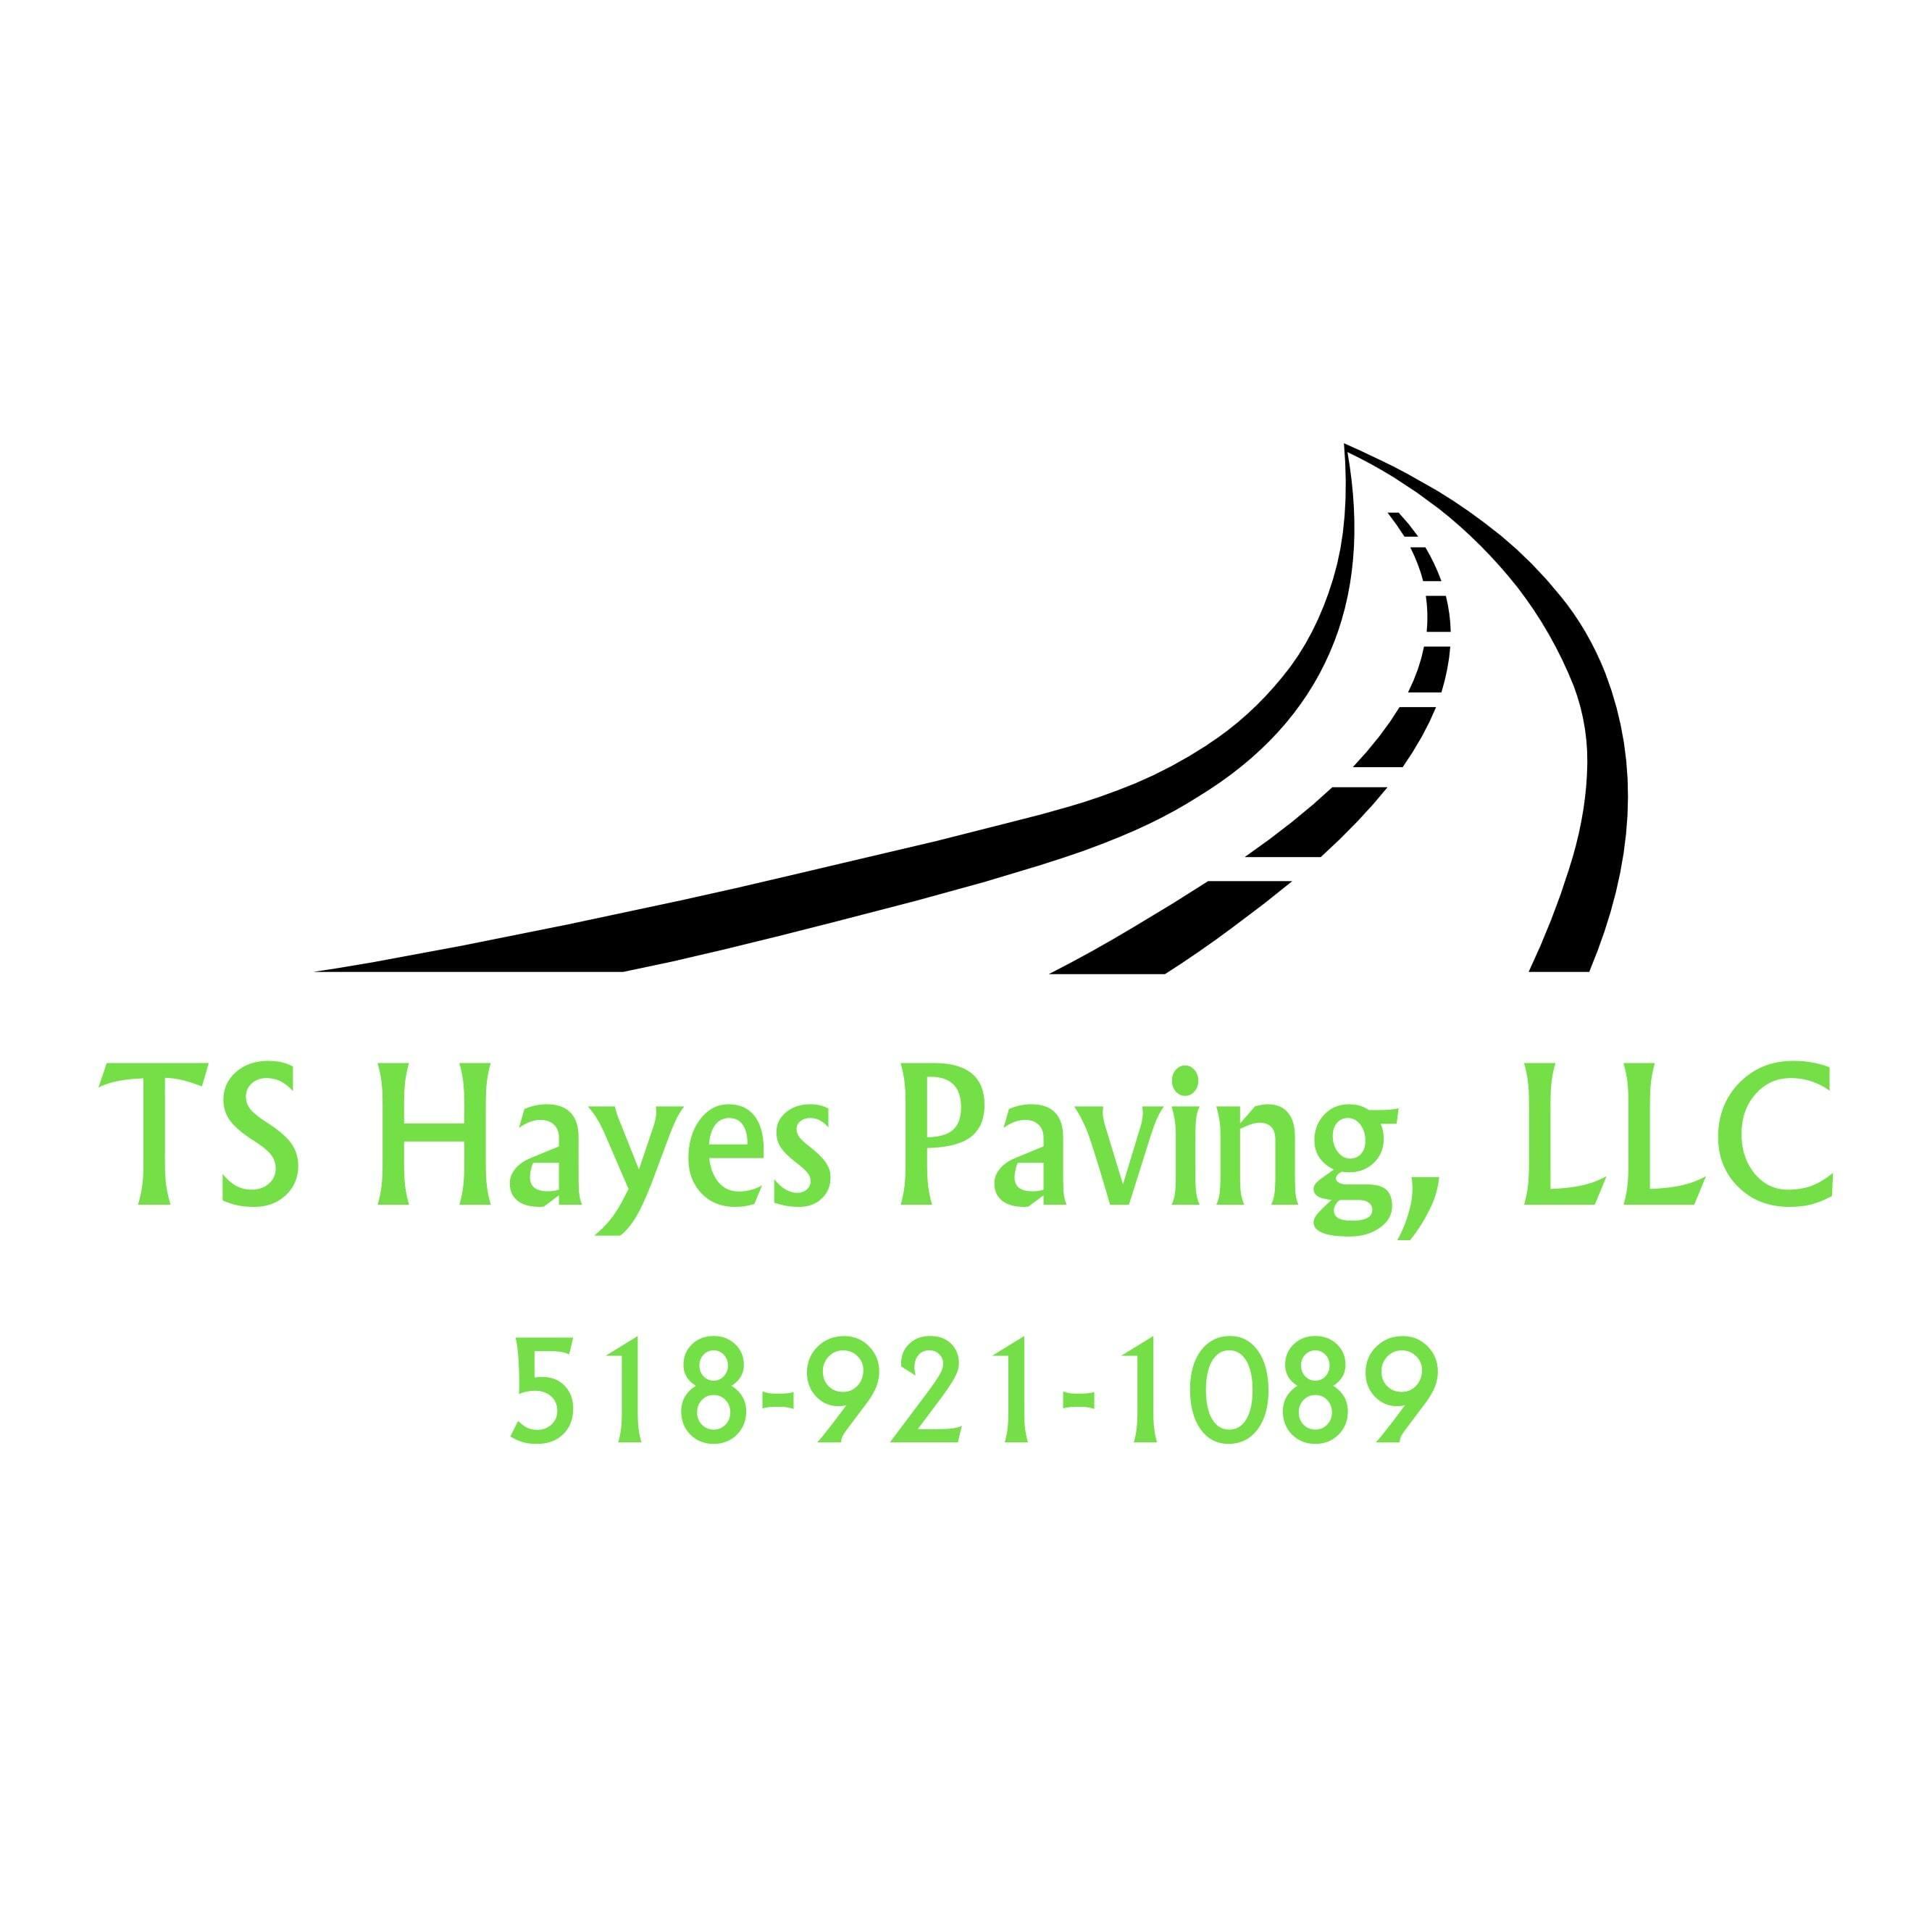 Ts Hayes Paving, Llc